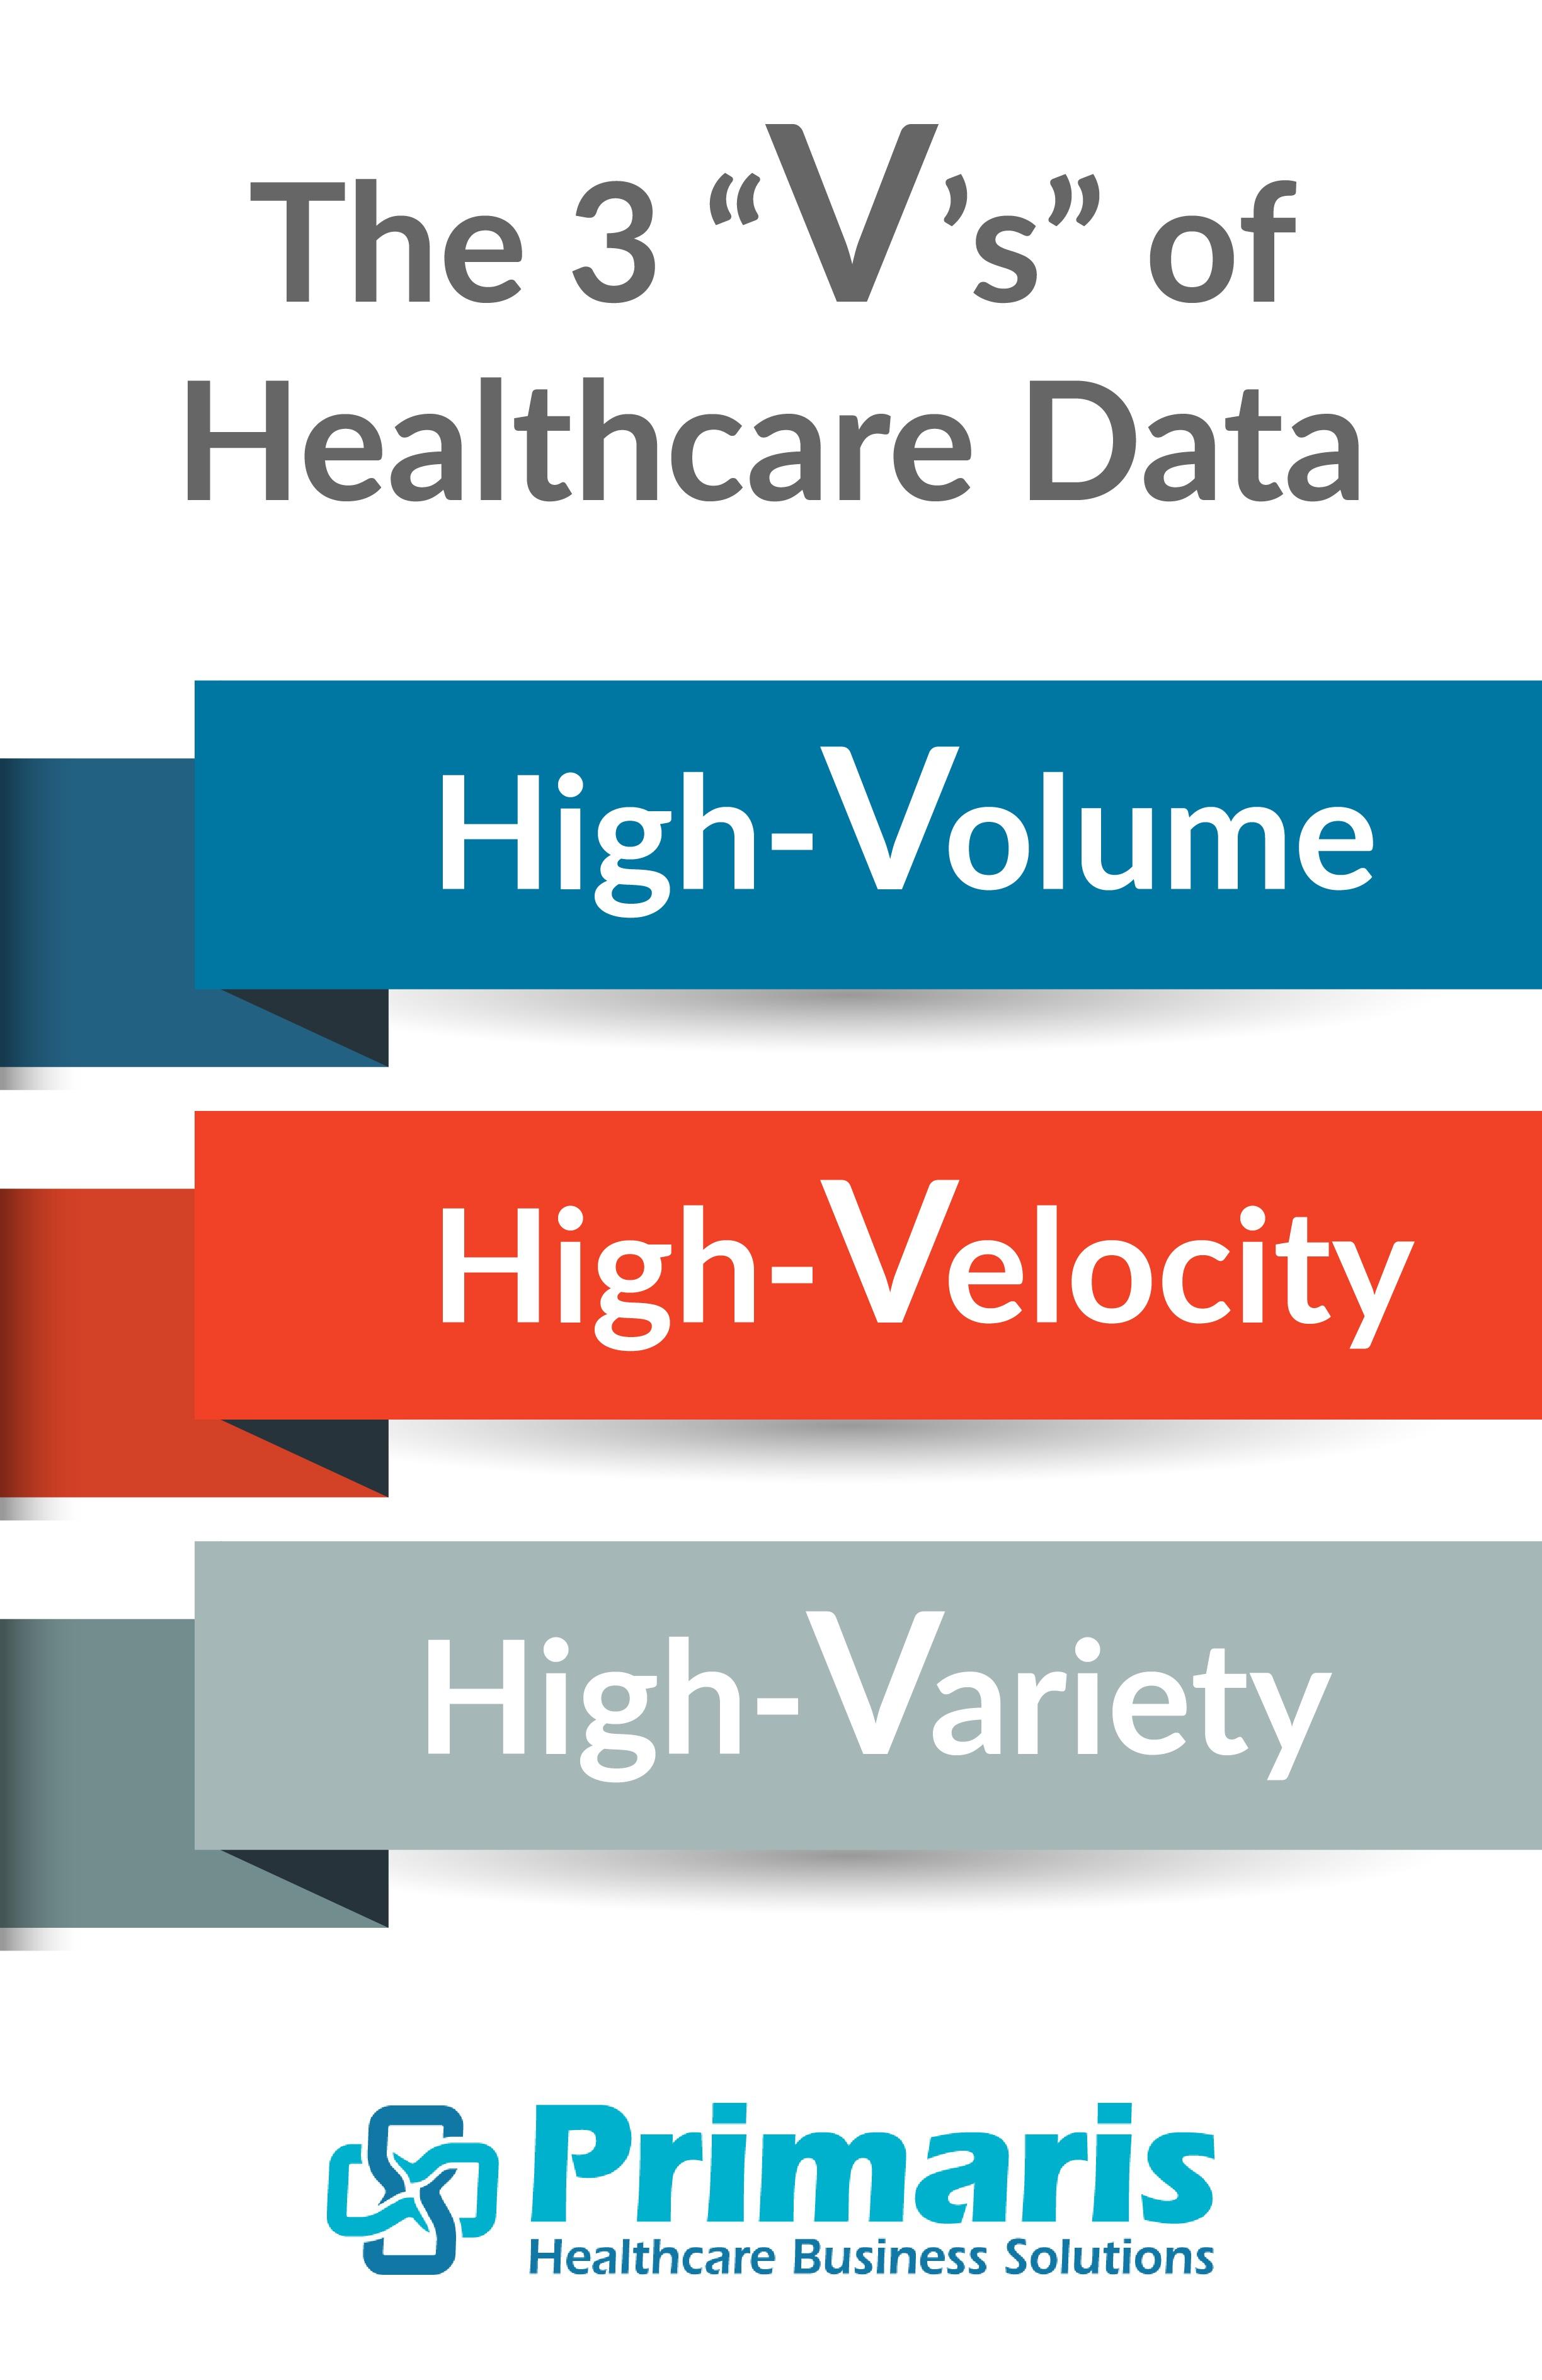 "The three ""V's"" of healthcare data: high-volume, high-velocity, high-variety."